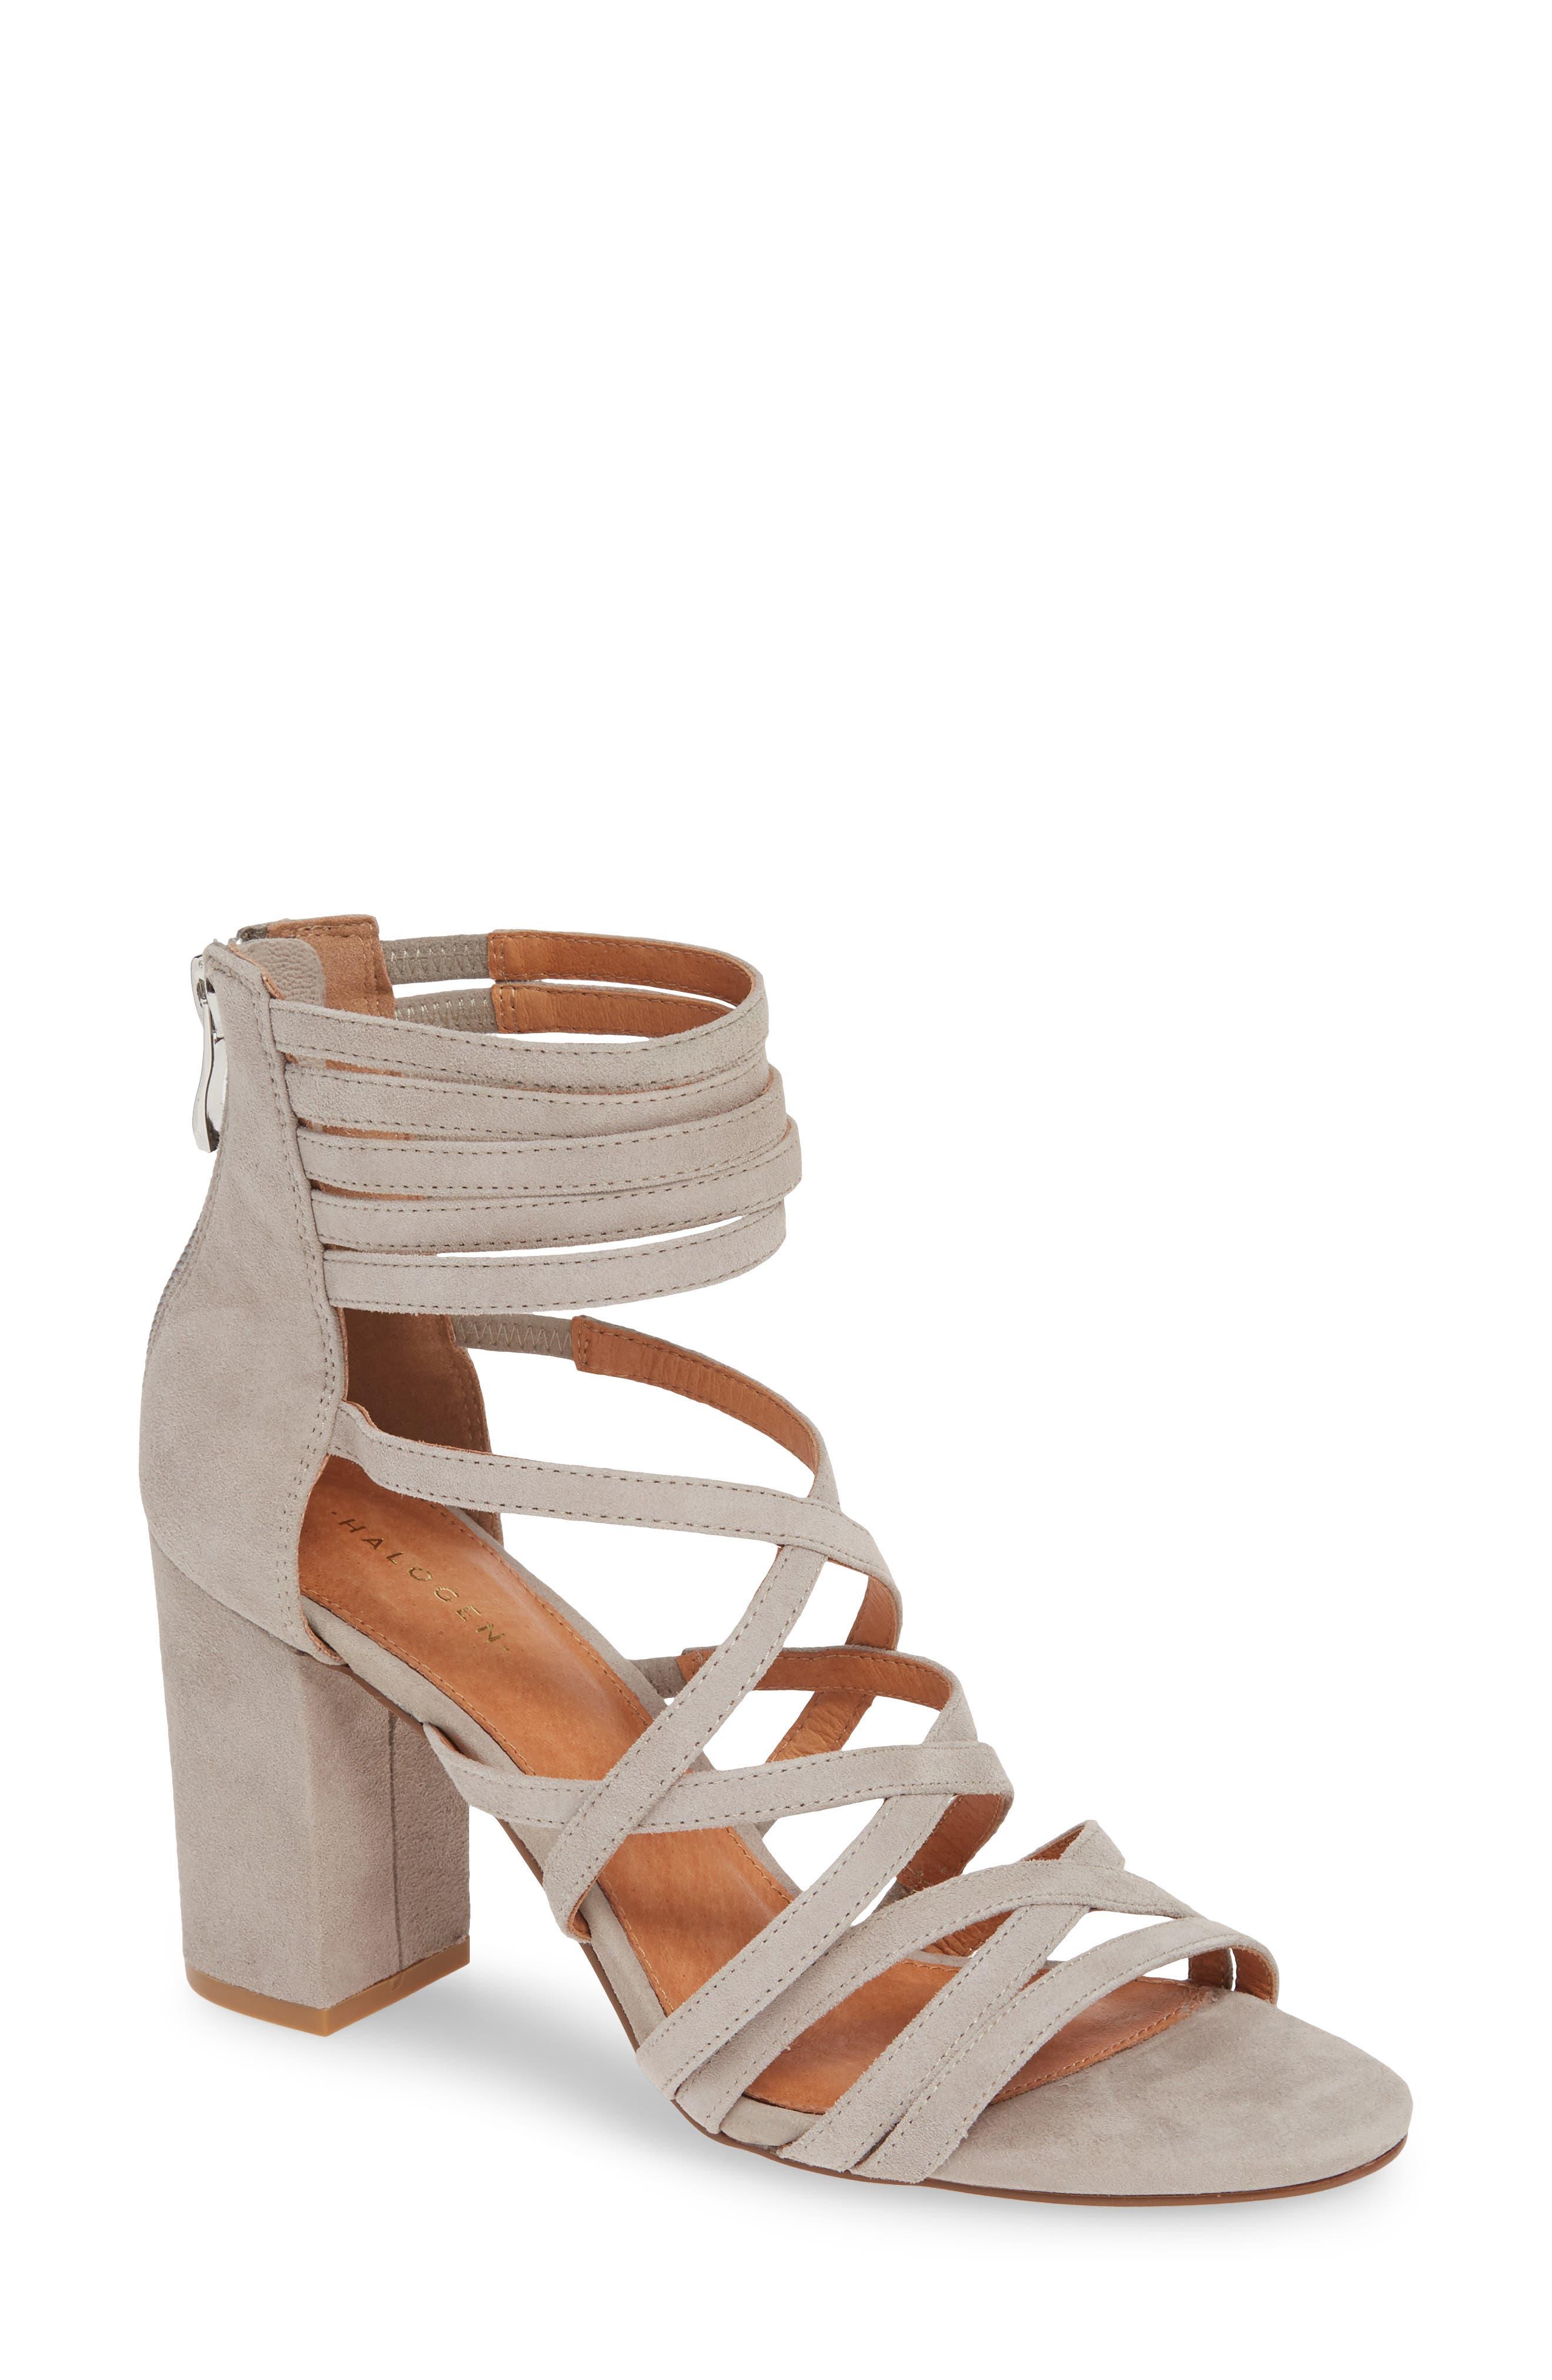 39fa1c07ad2 Women s Halogen® Sandals